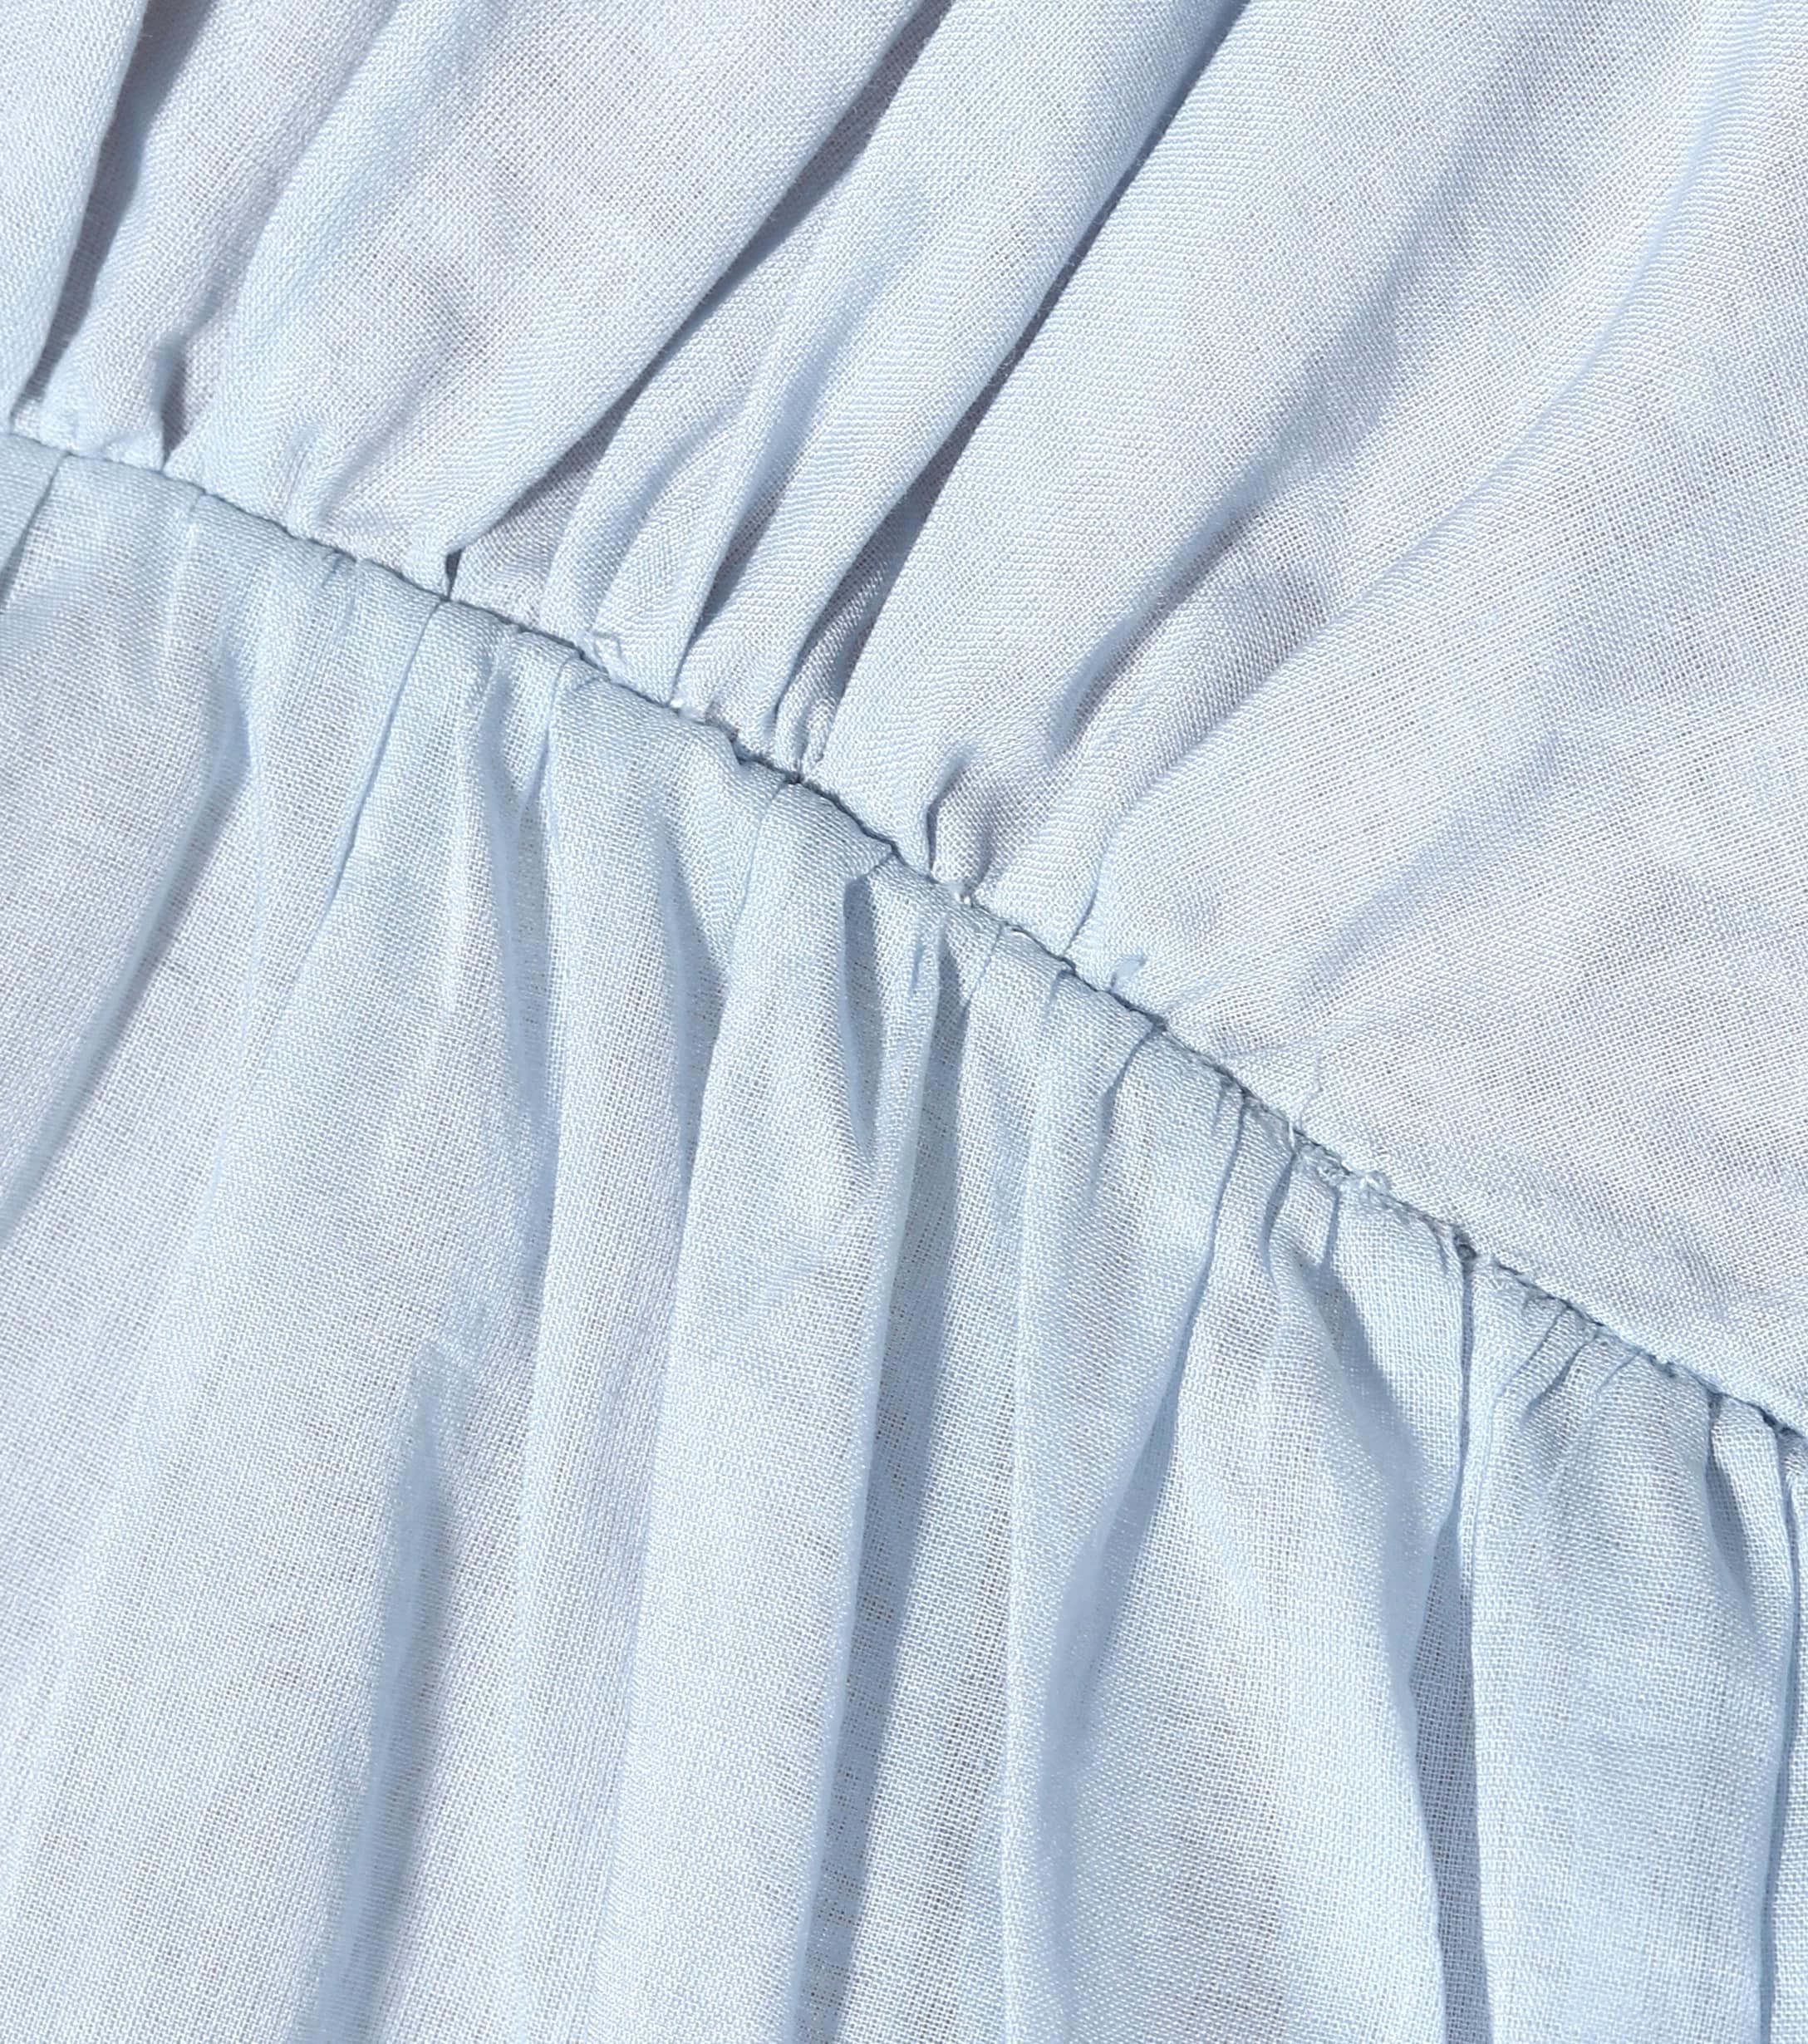 Vestido Aphrodite Cloud Day Kalita de Algodón de color Azul